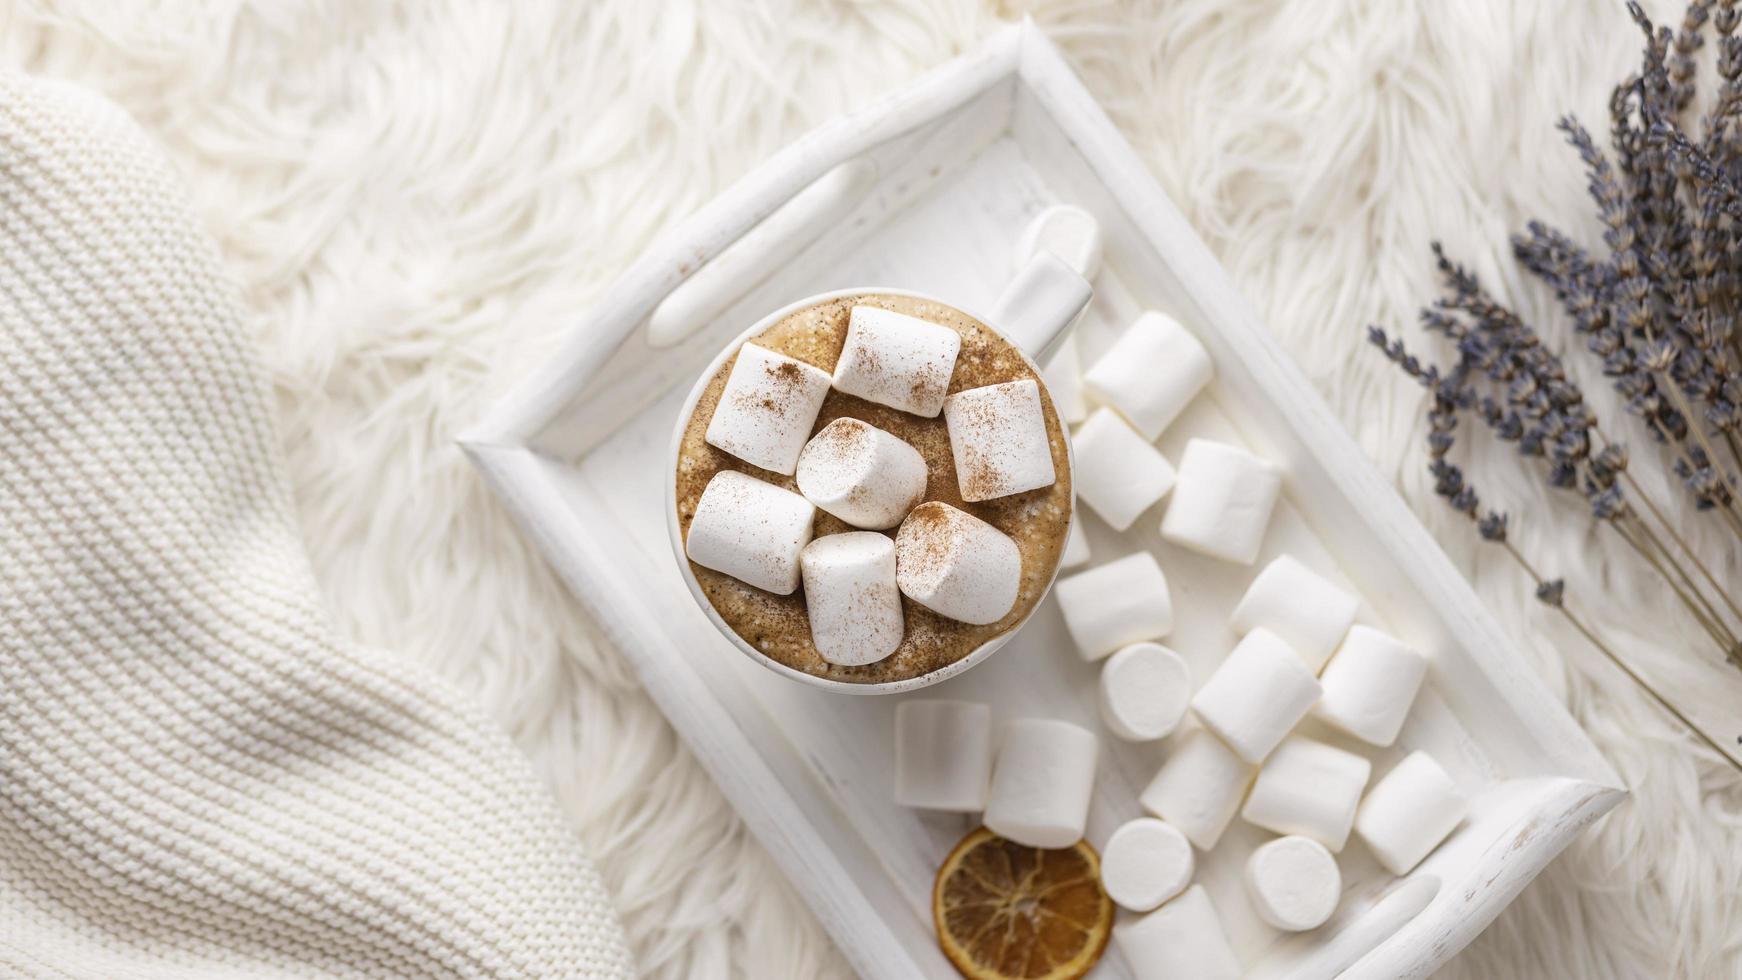 bovenaanzicht dienblad met kop marshmallows met lavendel foto